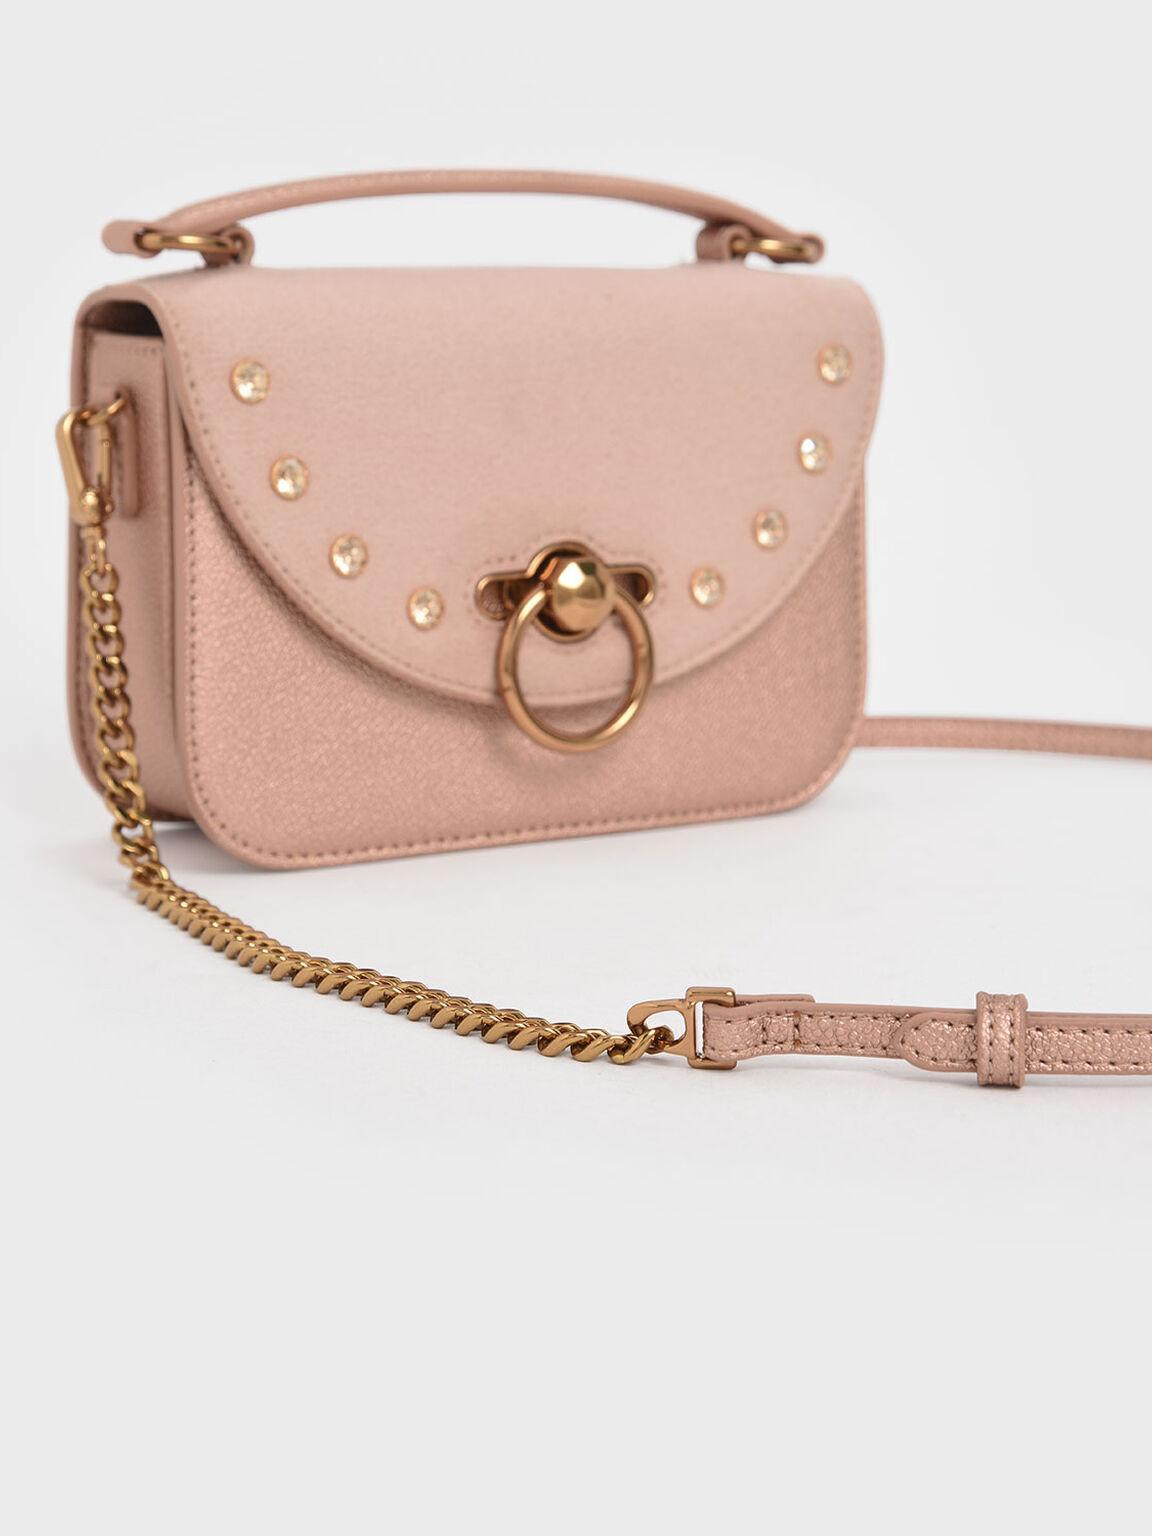 Ring Push Lock Embellished Bag, Rose Gold, hi-res